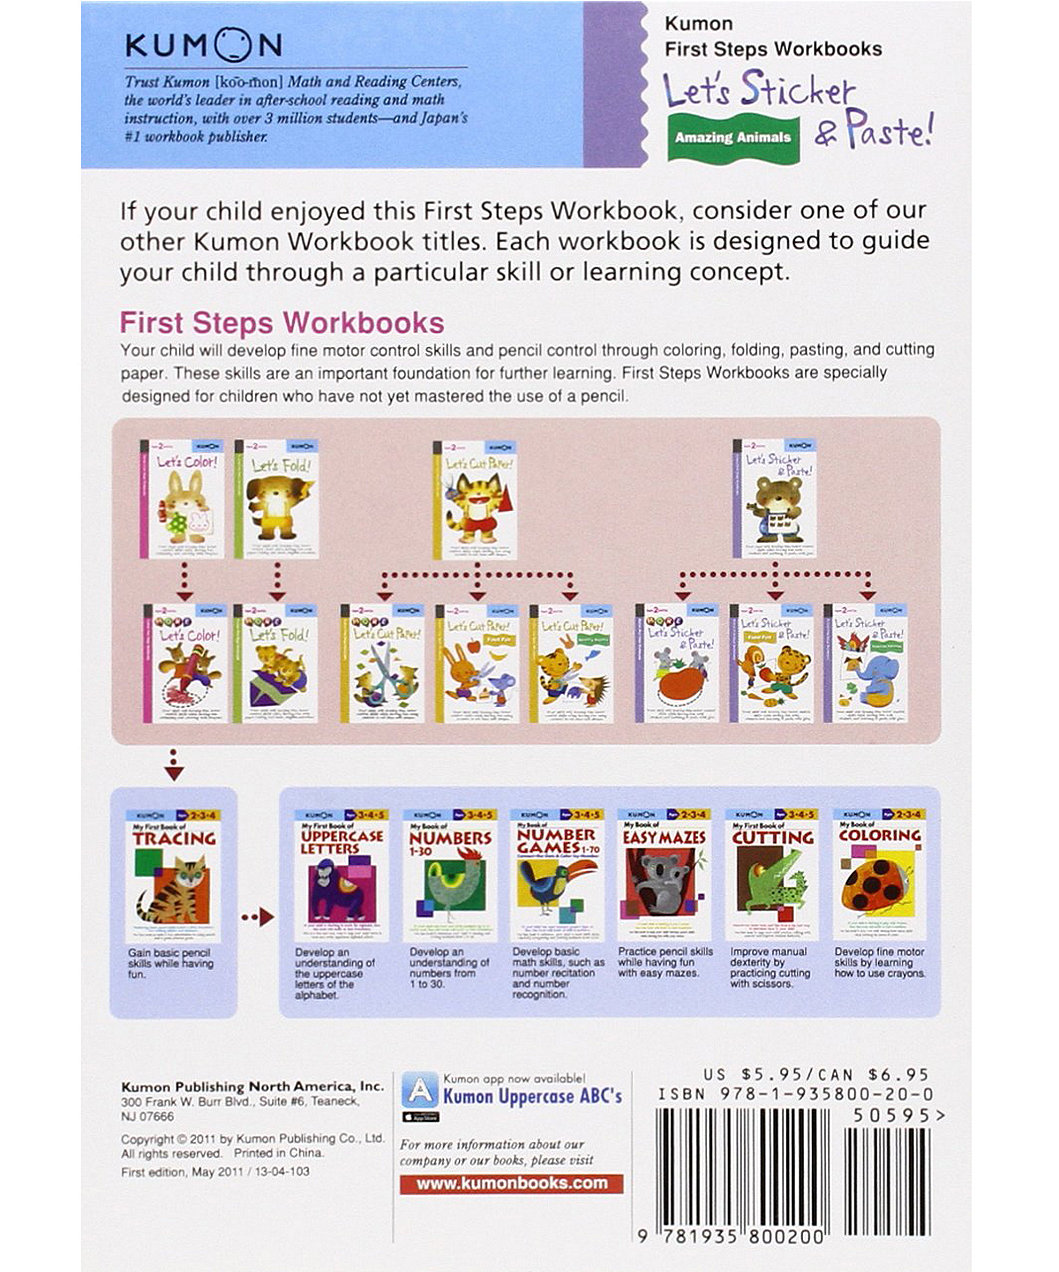 Workbooks buy kumon workbooks : Kumon Let's Sticker & Paste: Amazing Animals | ELC Indonesia